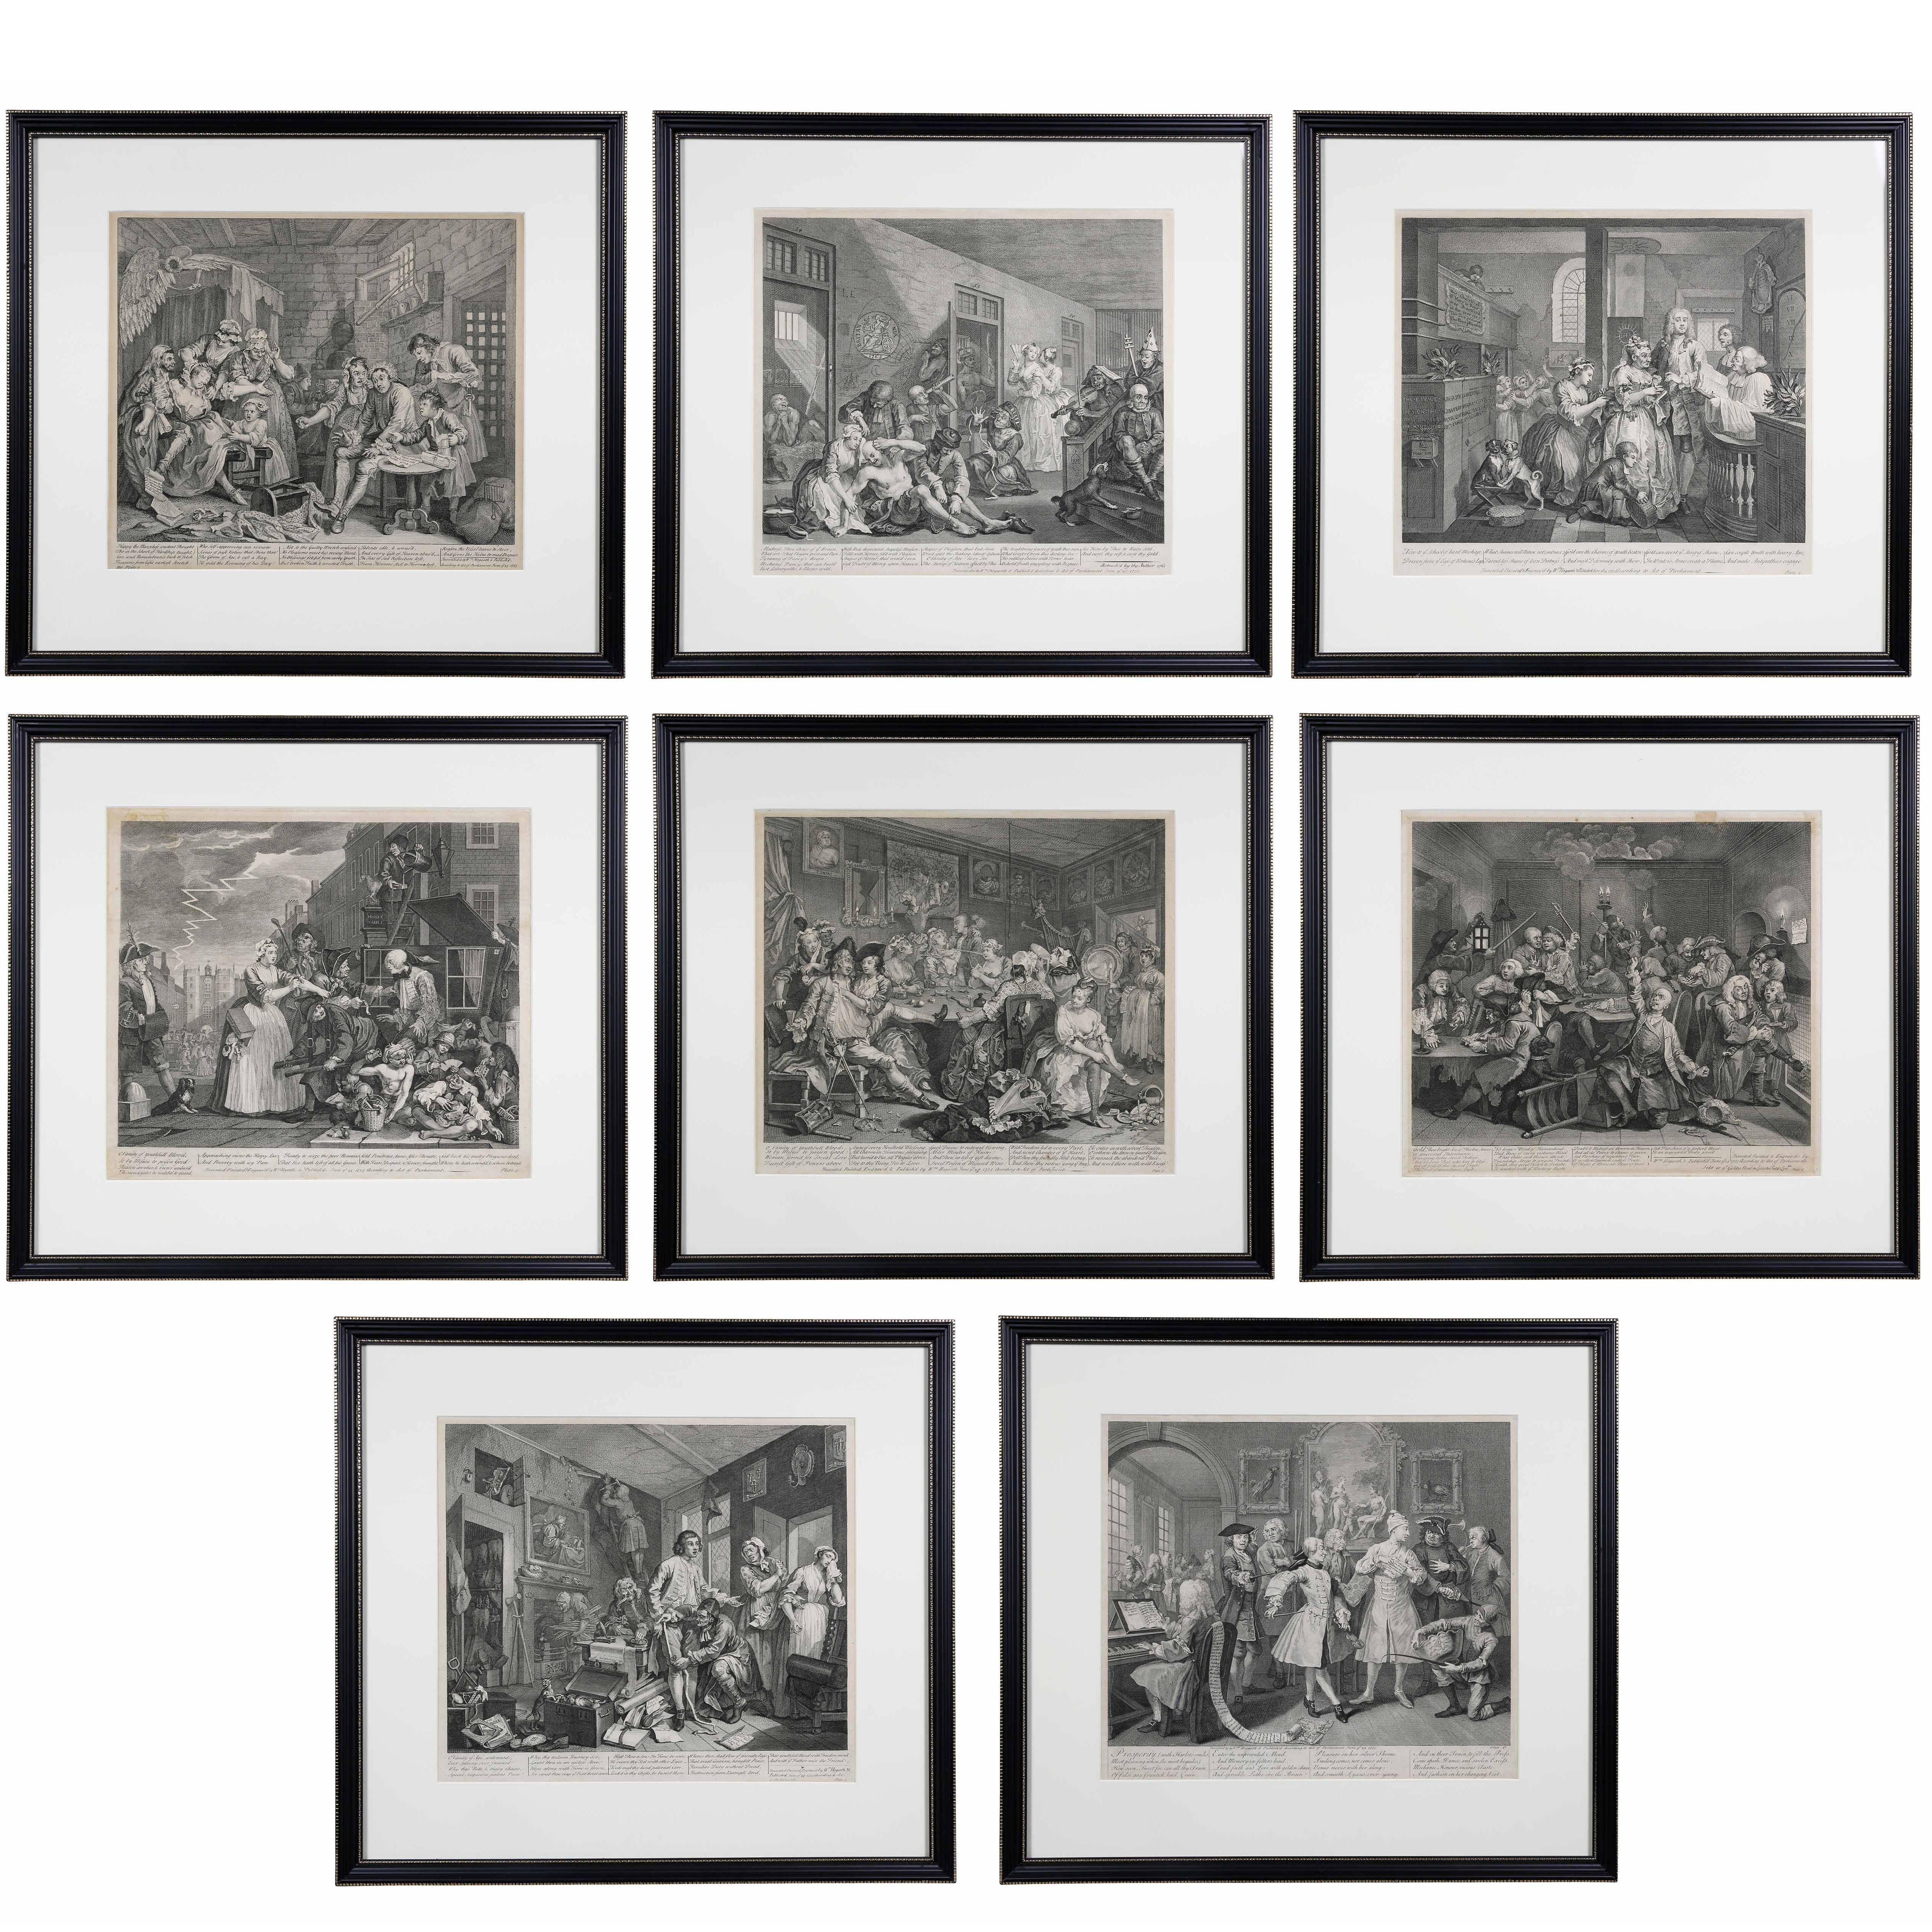 William Hogarth, Complete Set of Eight Engravings of 'The Rakes Progress'